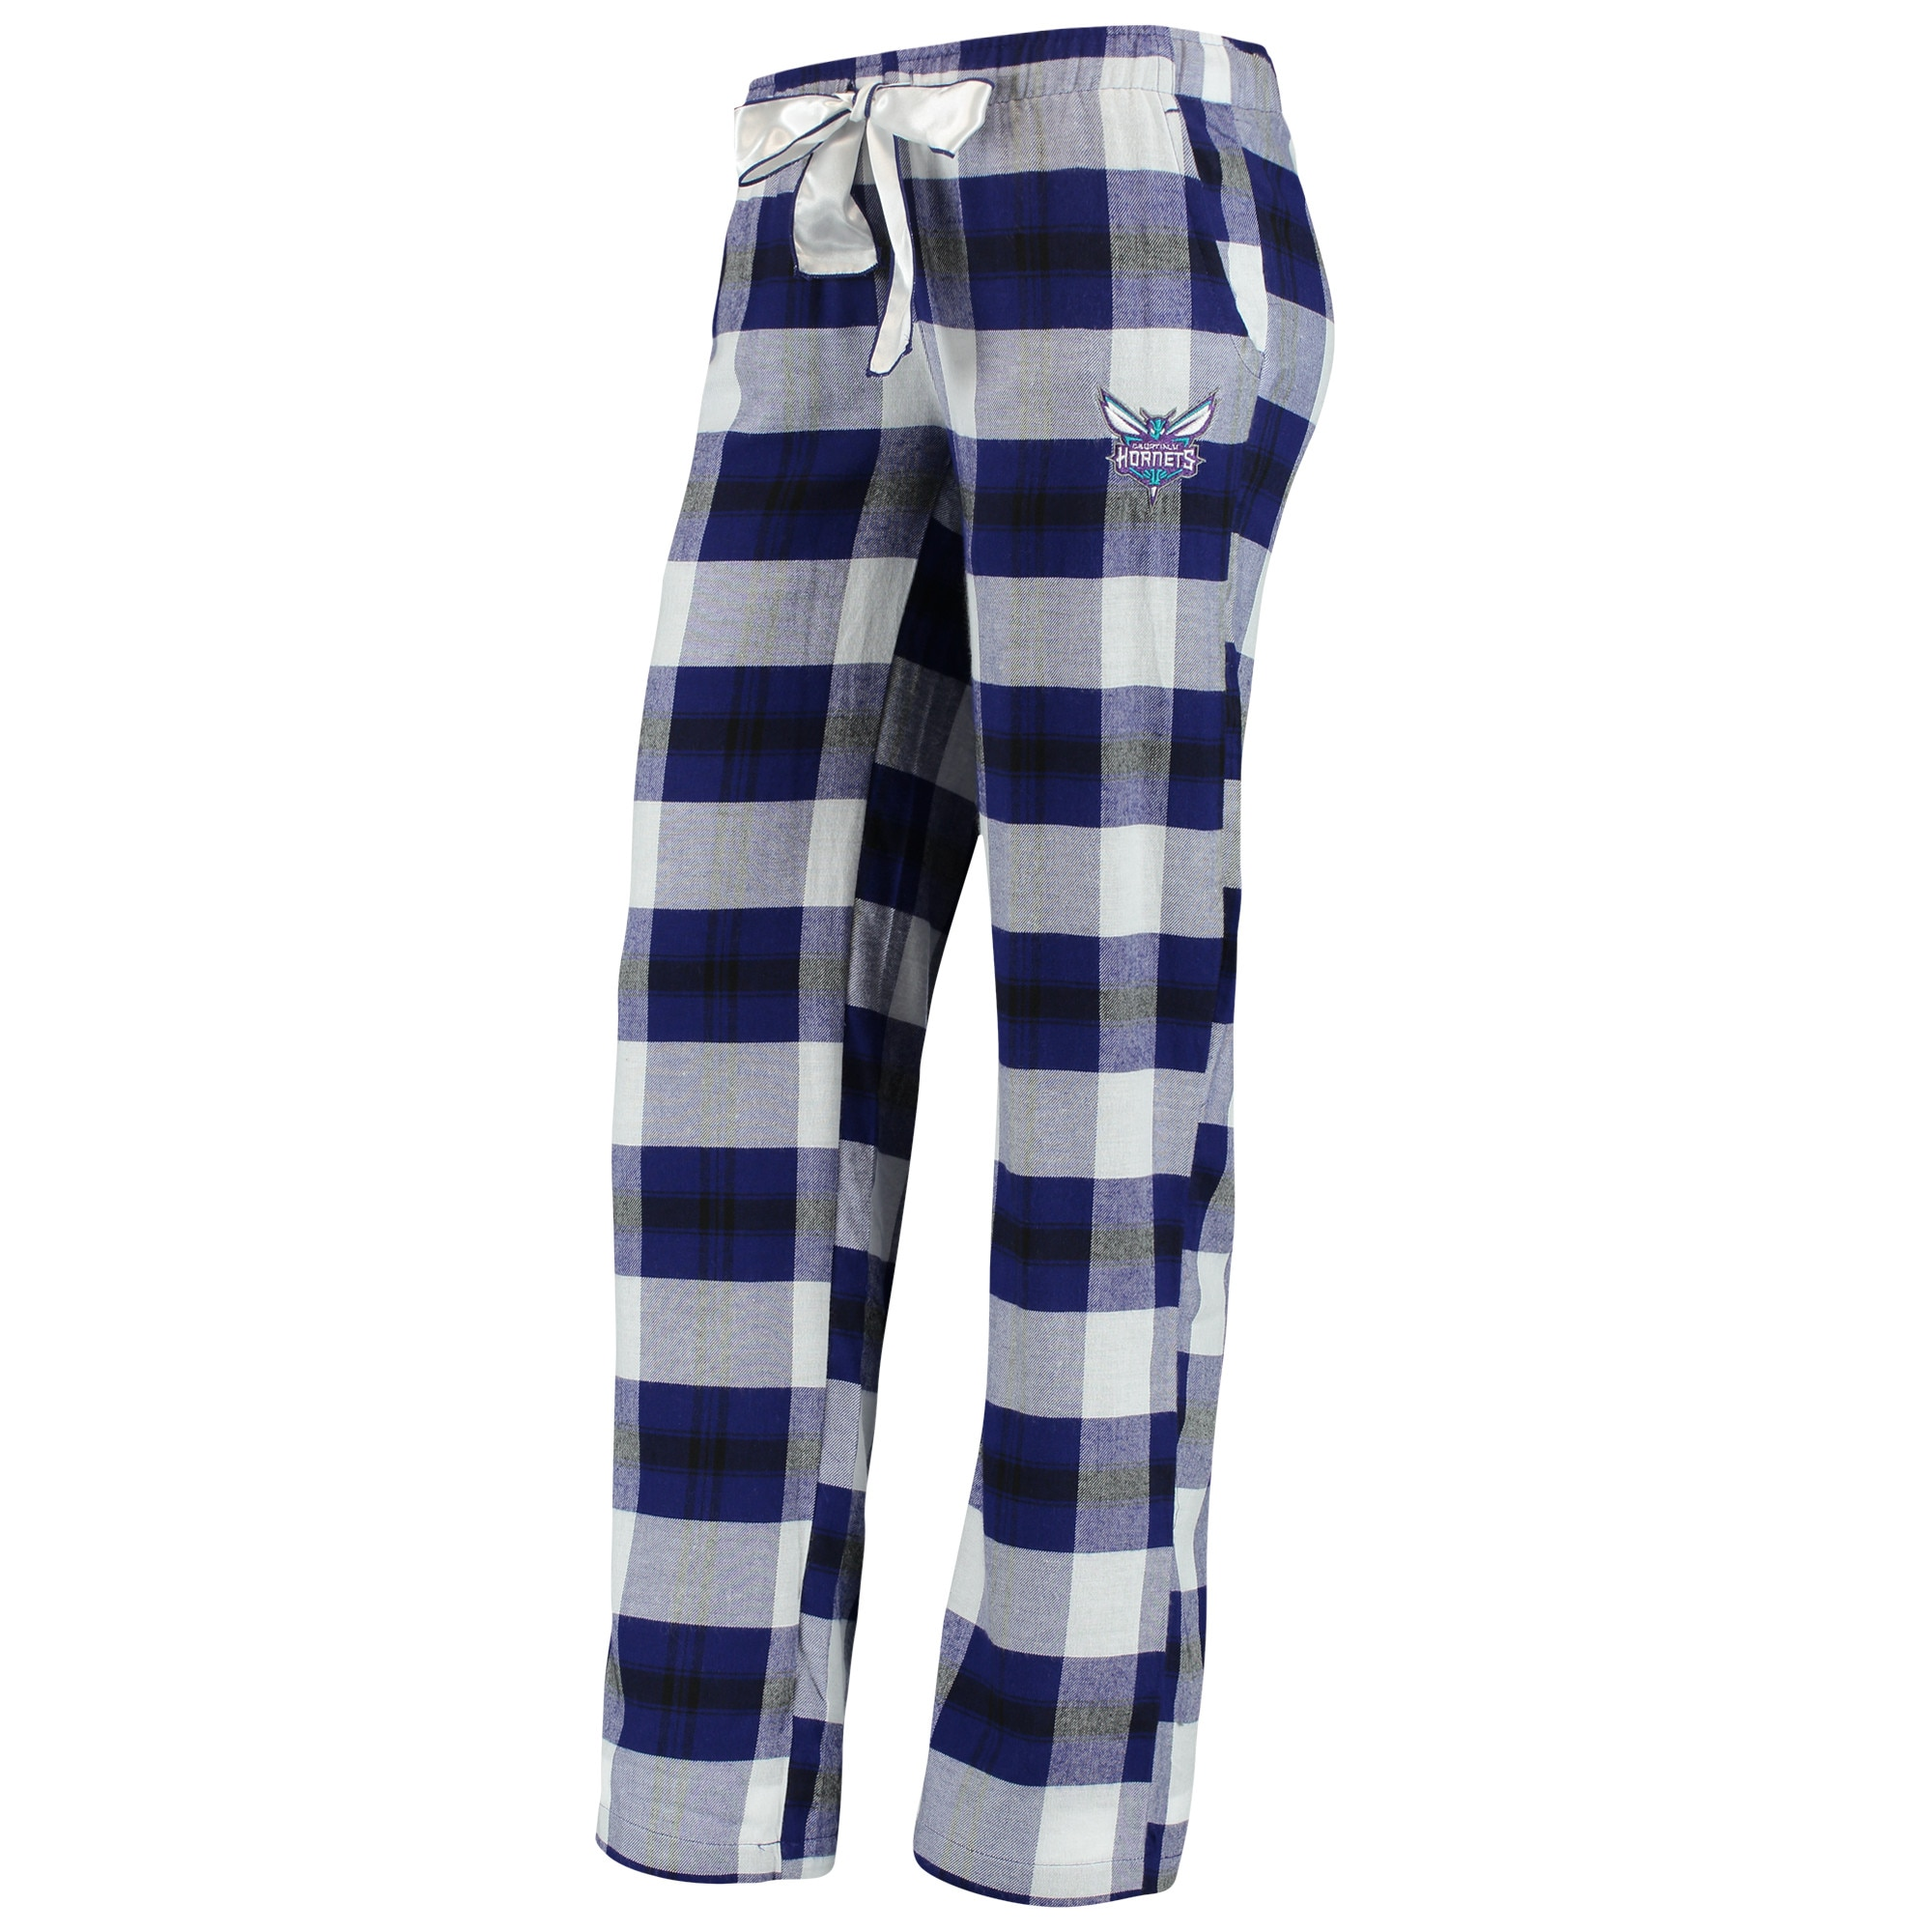 Charlotte Hornets Concepts Sport Women's Headway Flannel Pants - Purple/Black